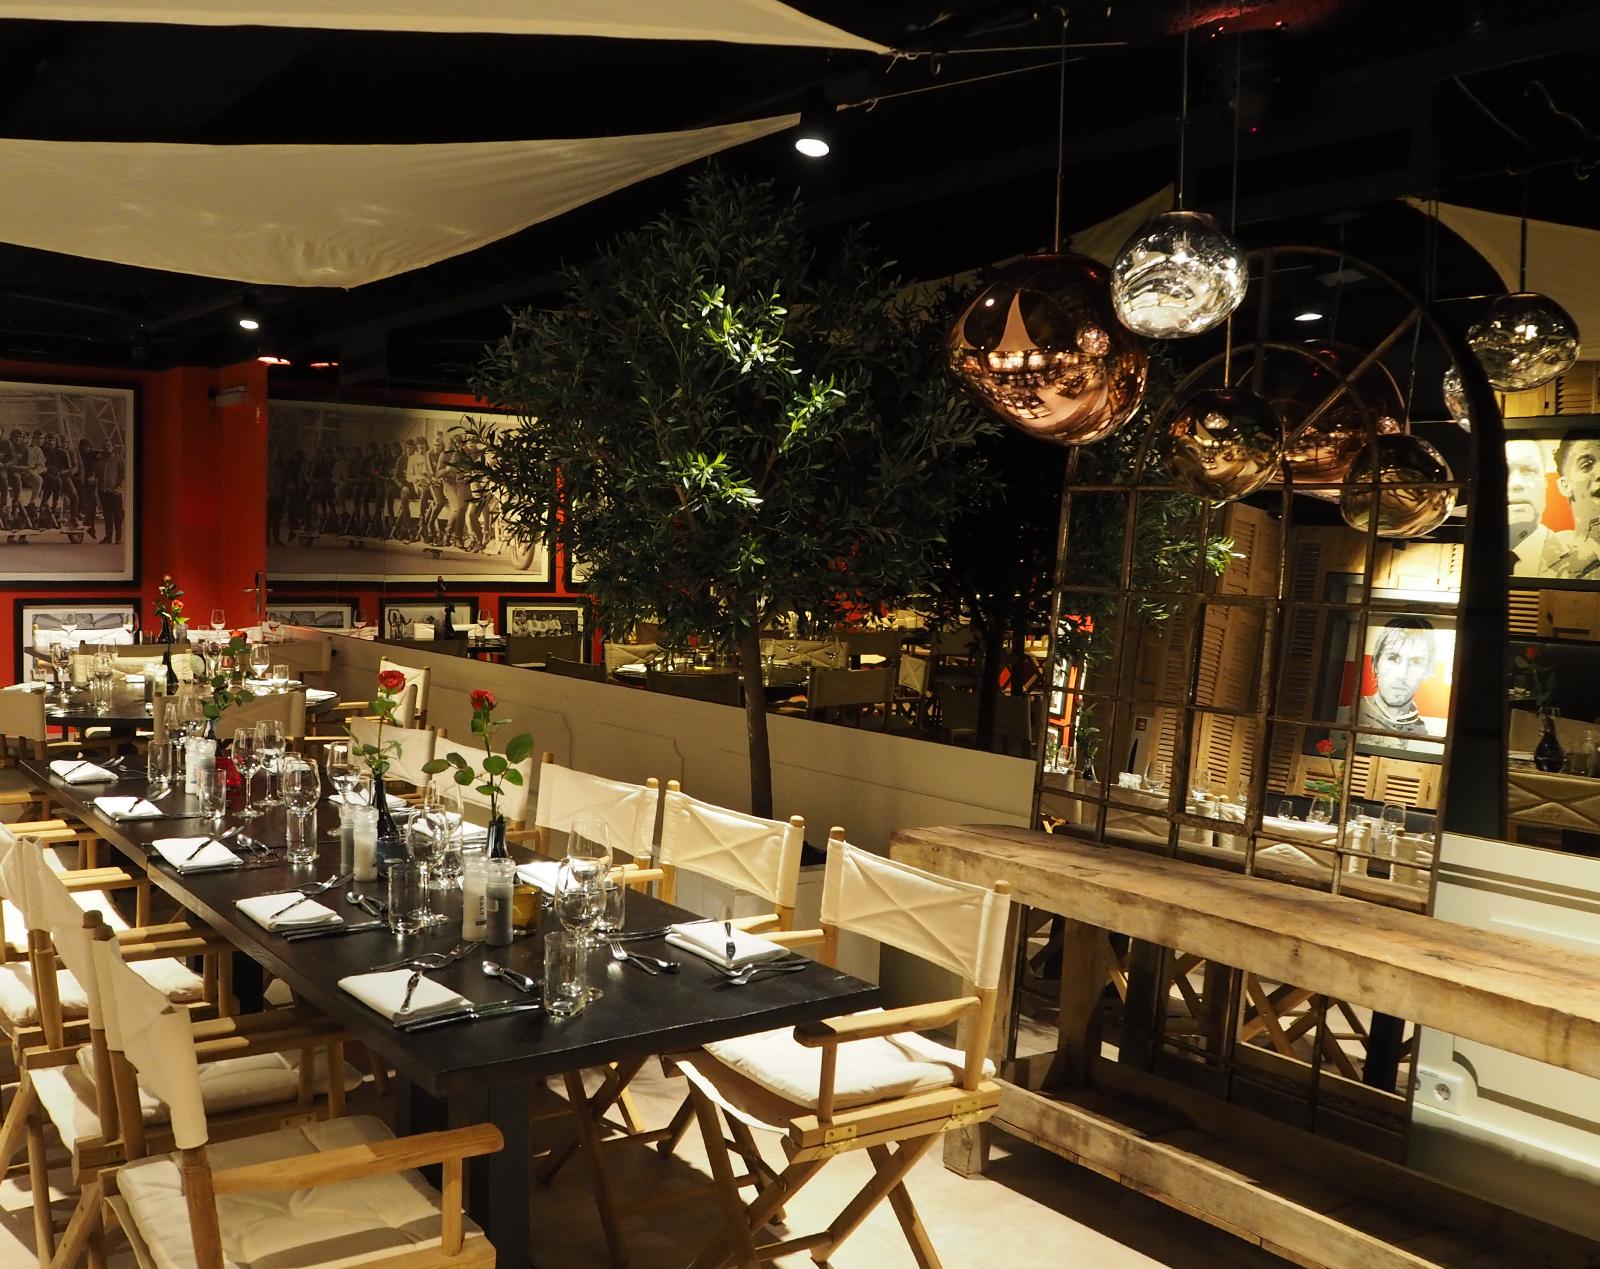 Paardenburg restaurant, Paardenburg bij Bobby, Mirror, Ajax Amsterdam Arena, skybox stadion, by Jeroen de Nijs